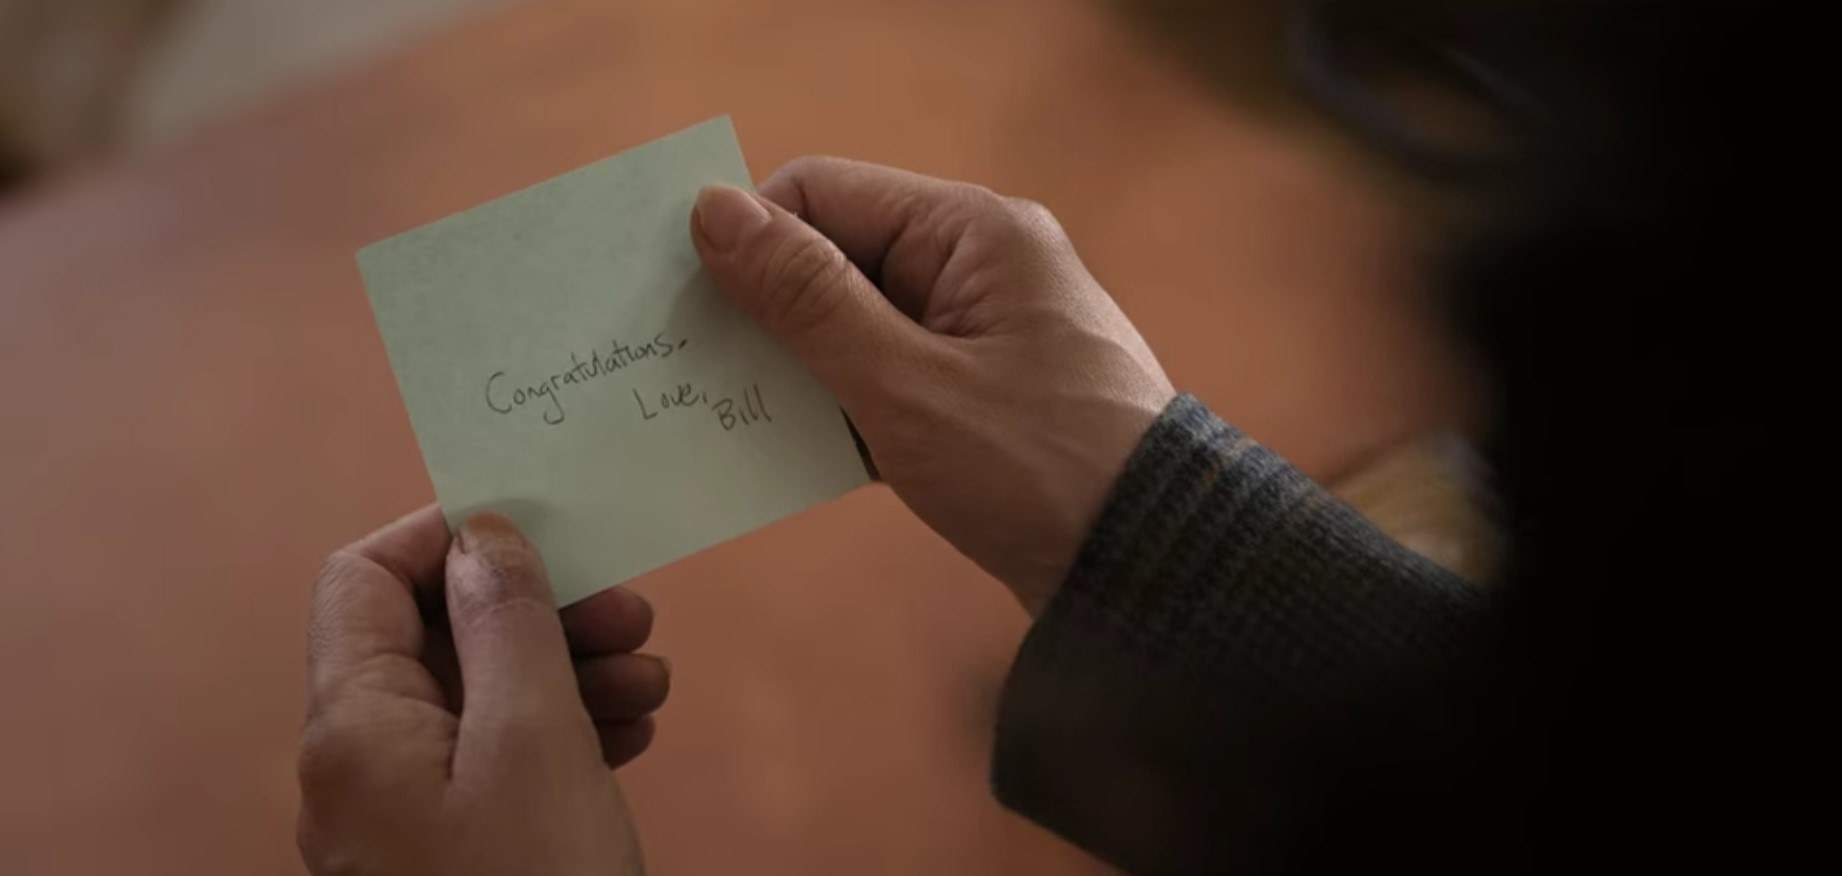 "Ji-Yoon reads note that says ""Congratulations. Love, Bill"""